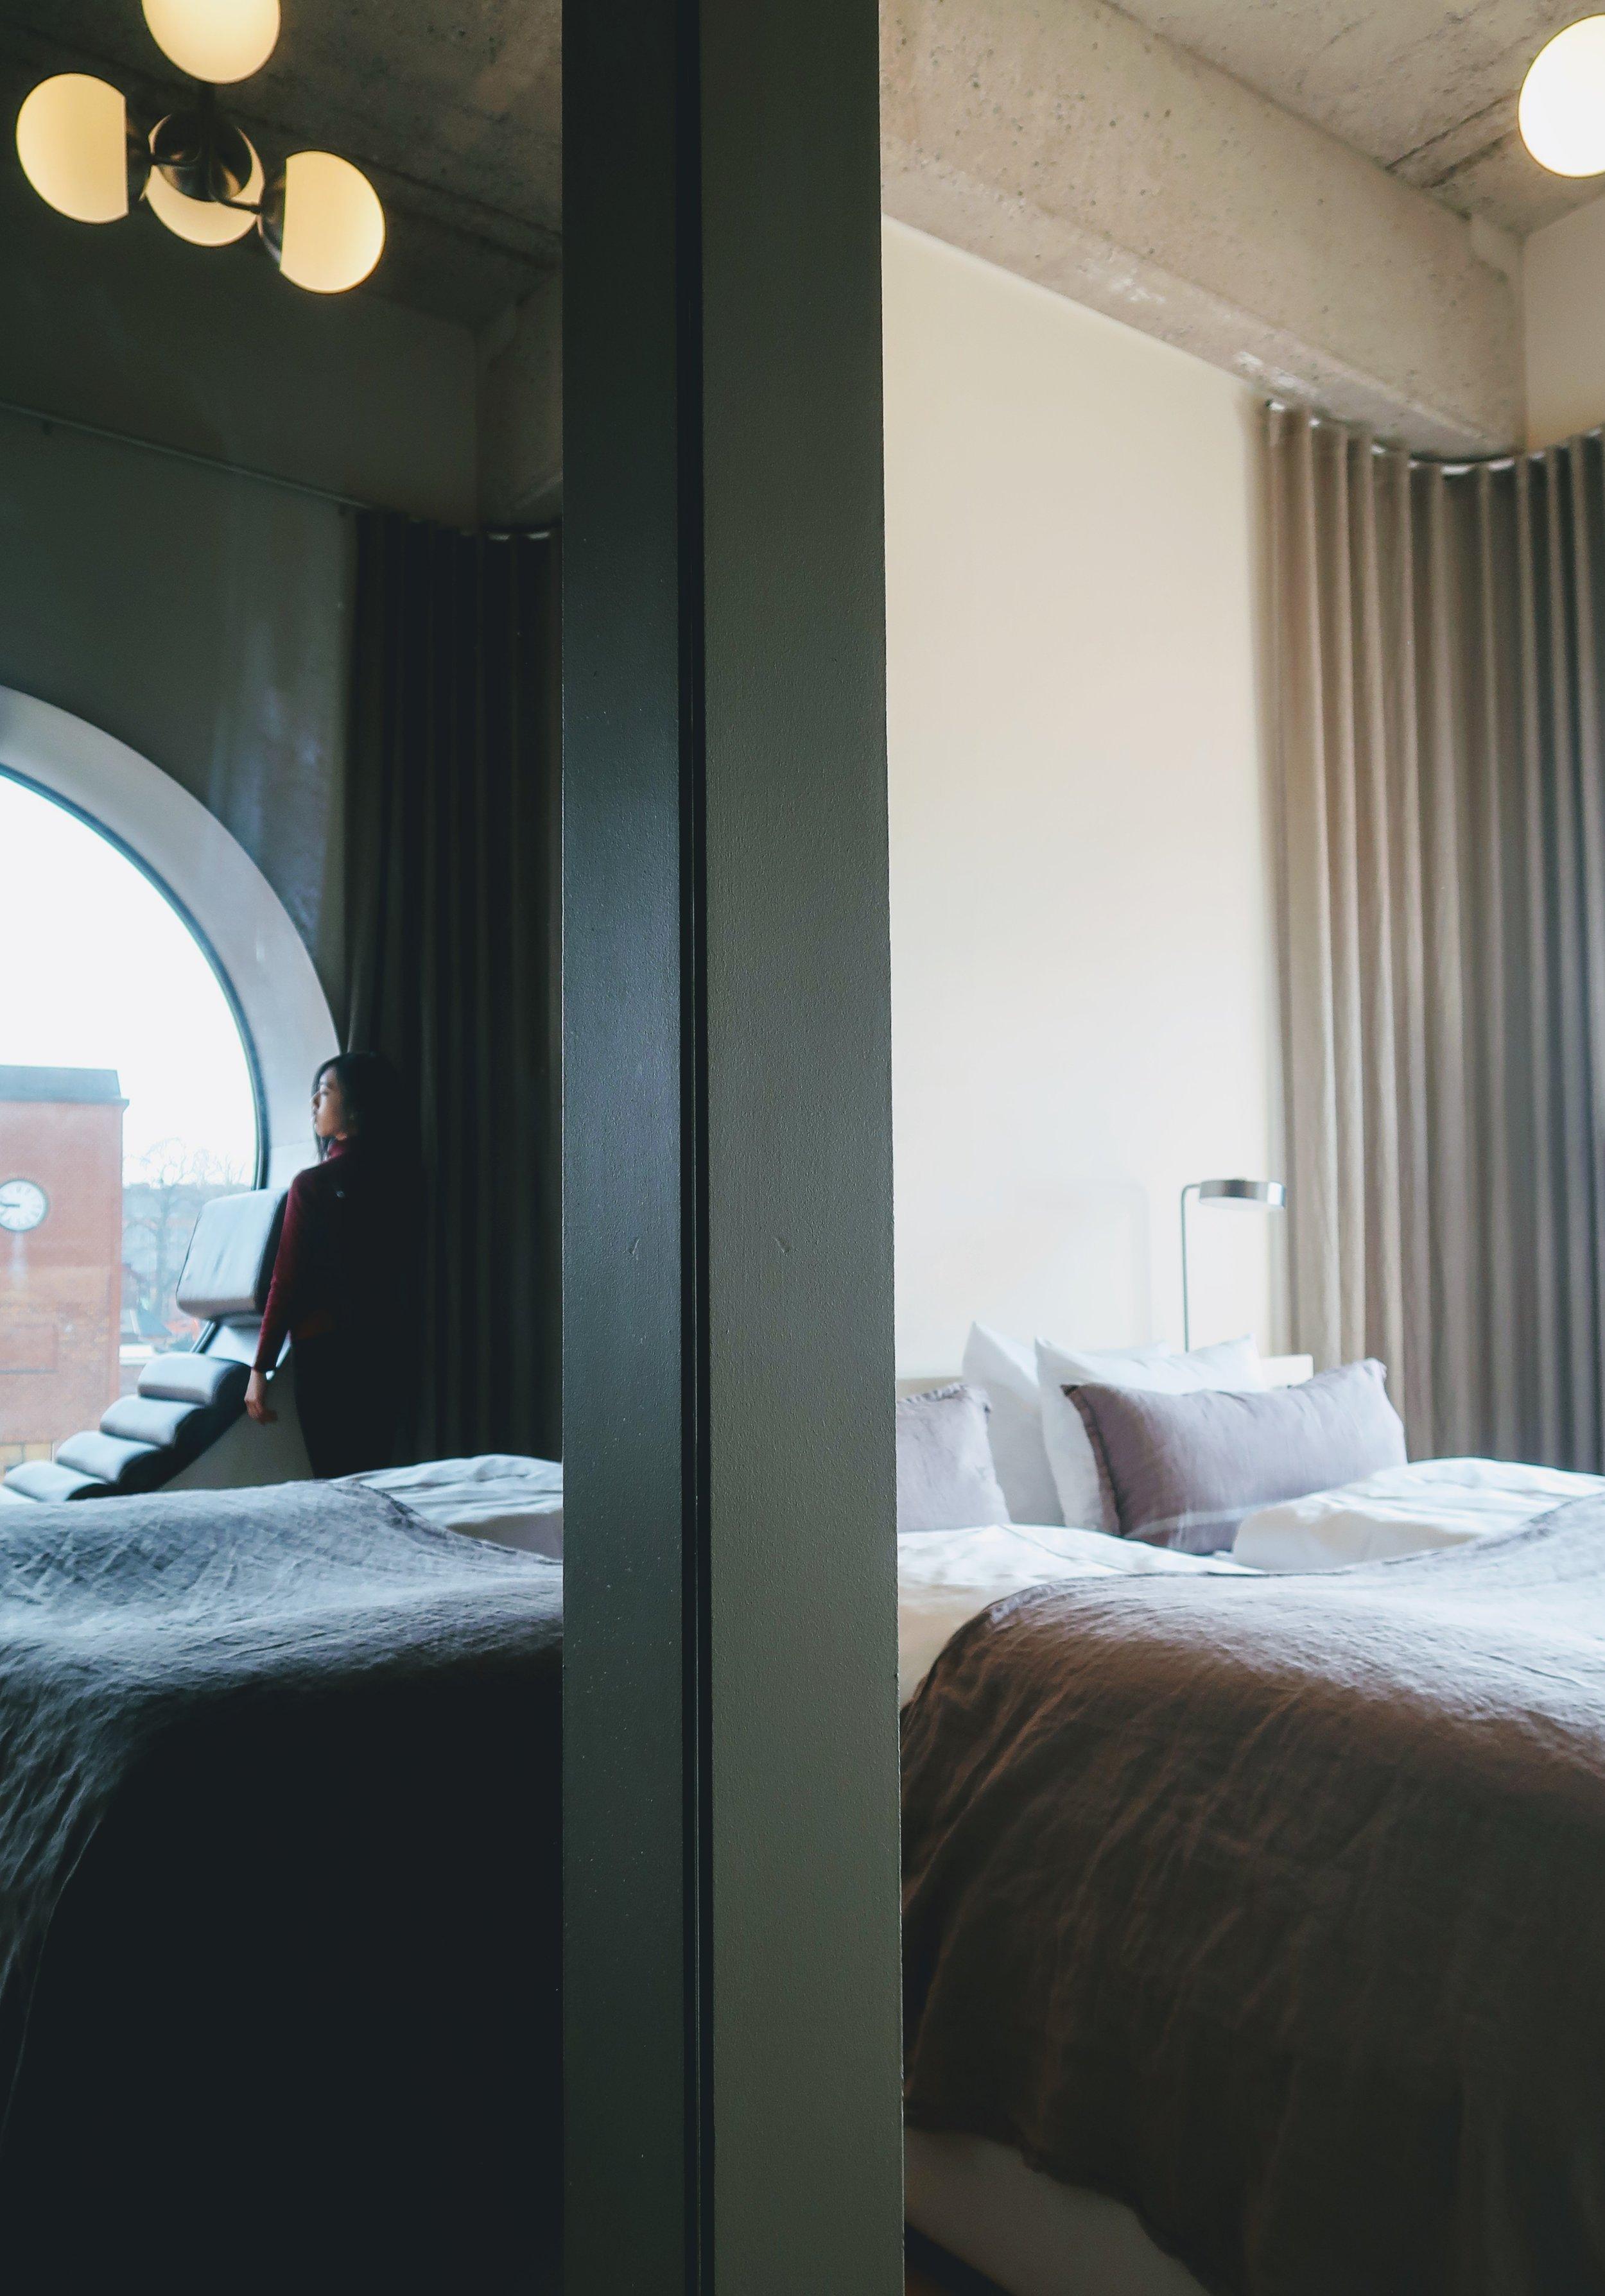 hotel-ottilia-staycation